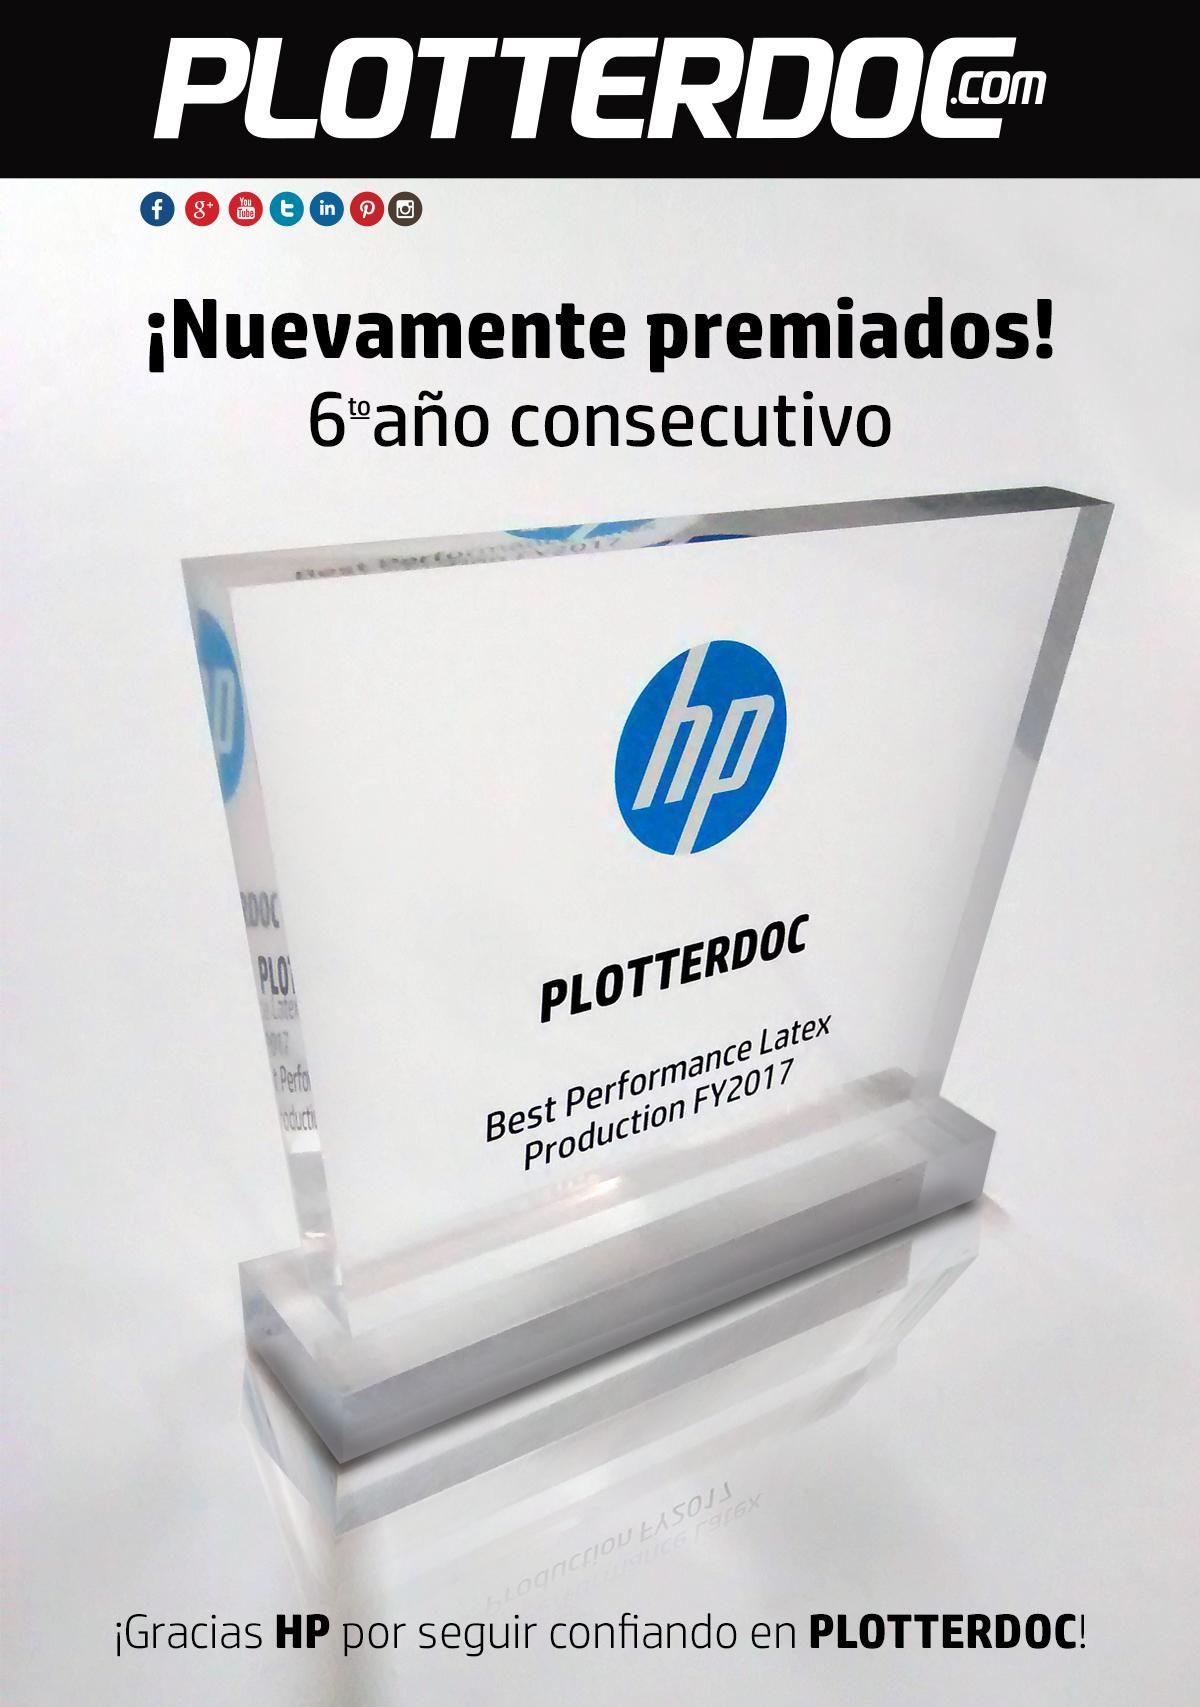 HP PREMA A PLOTTERDOC.COM POR SEXTO AÑO CONSECUTIVO